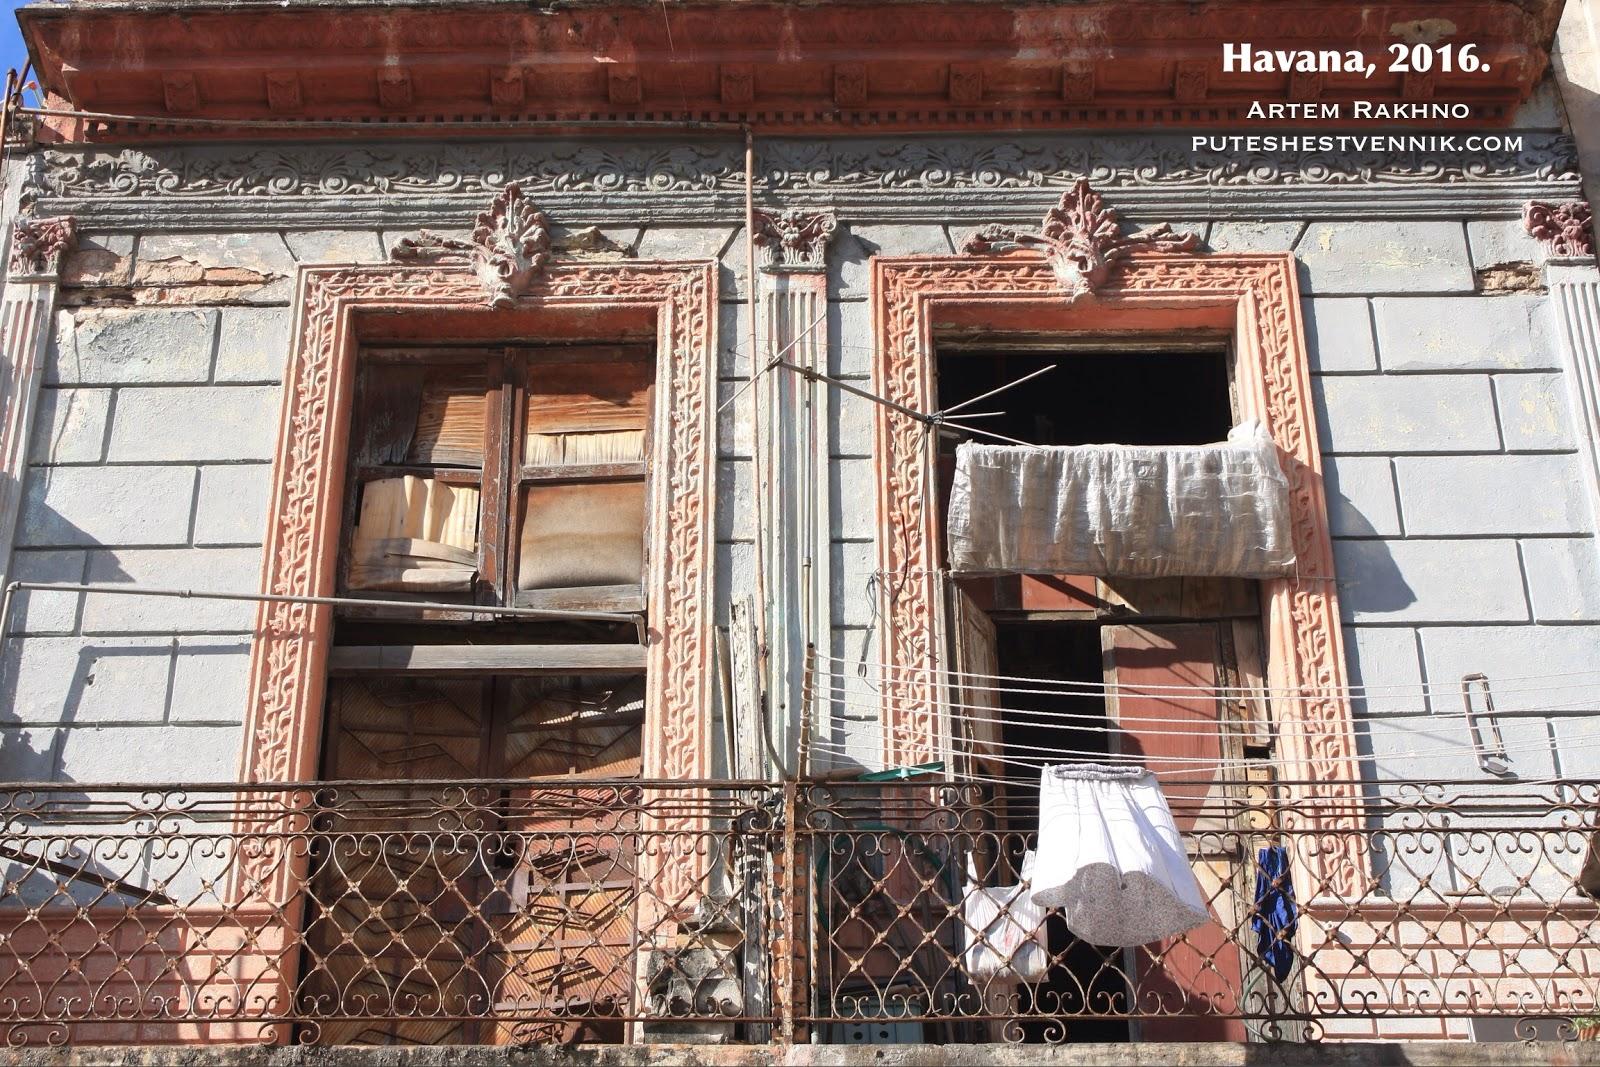 Балкон старинного дома в Гаване